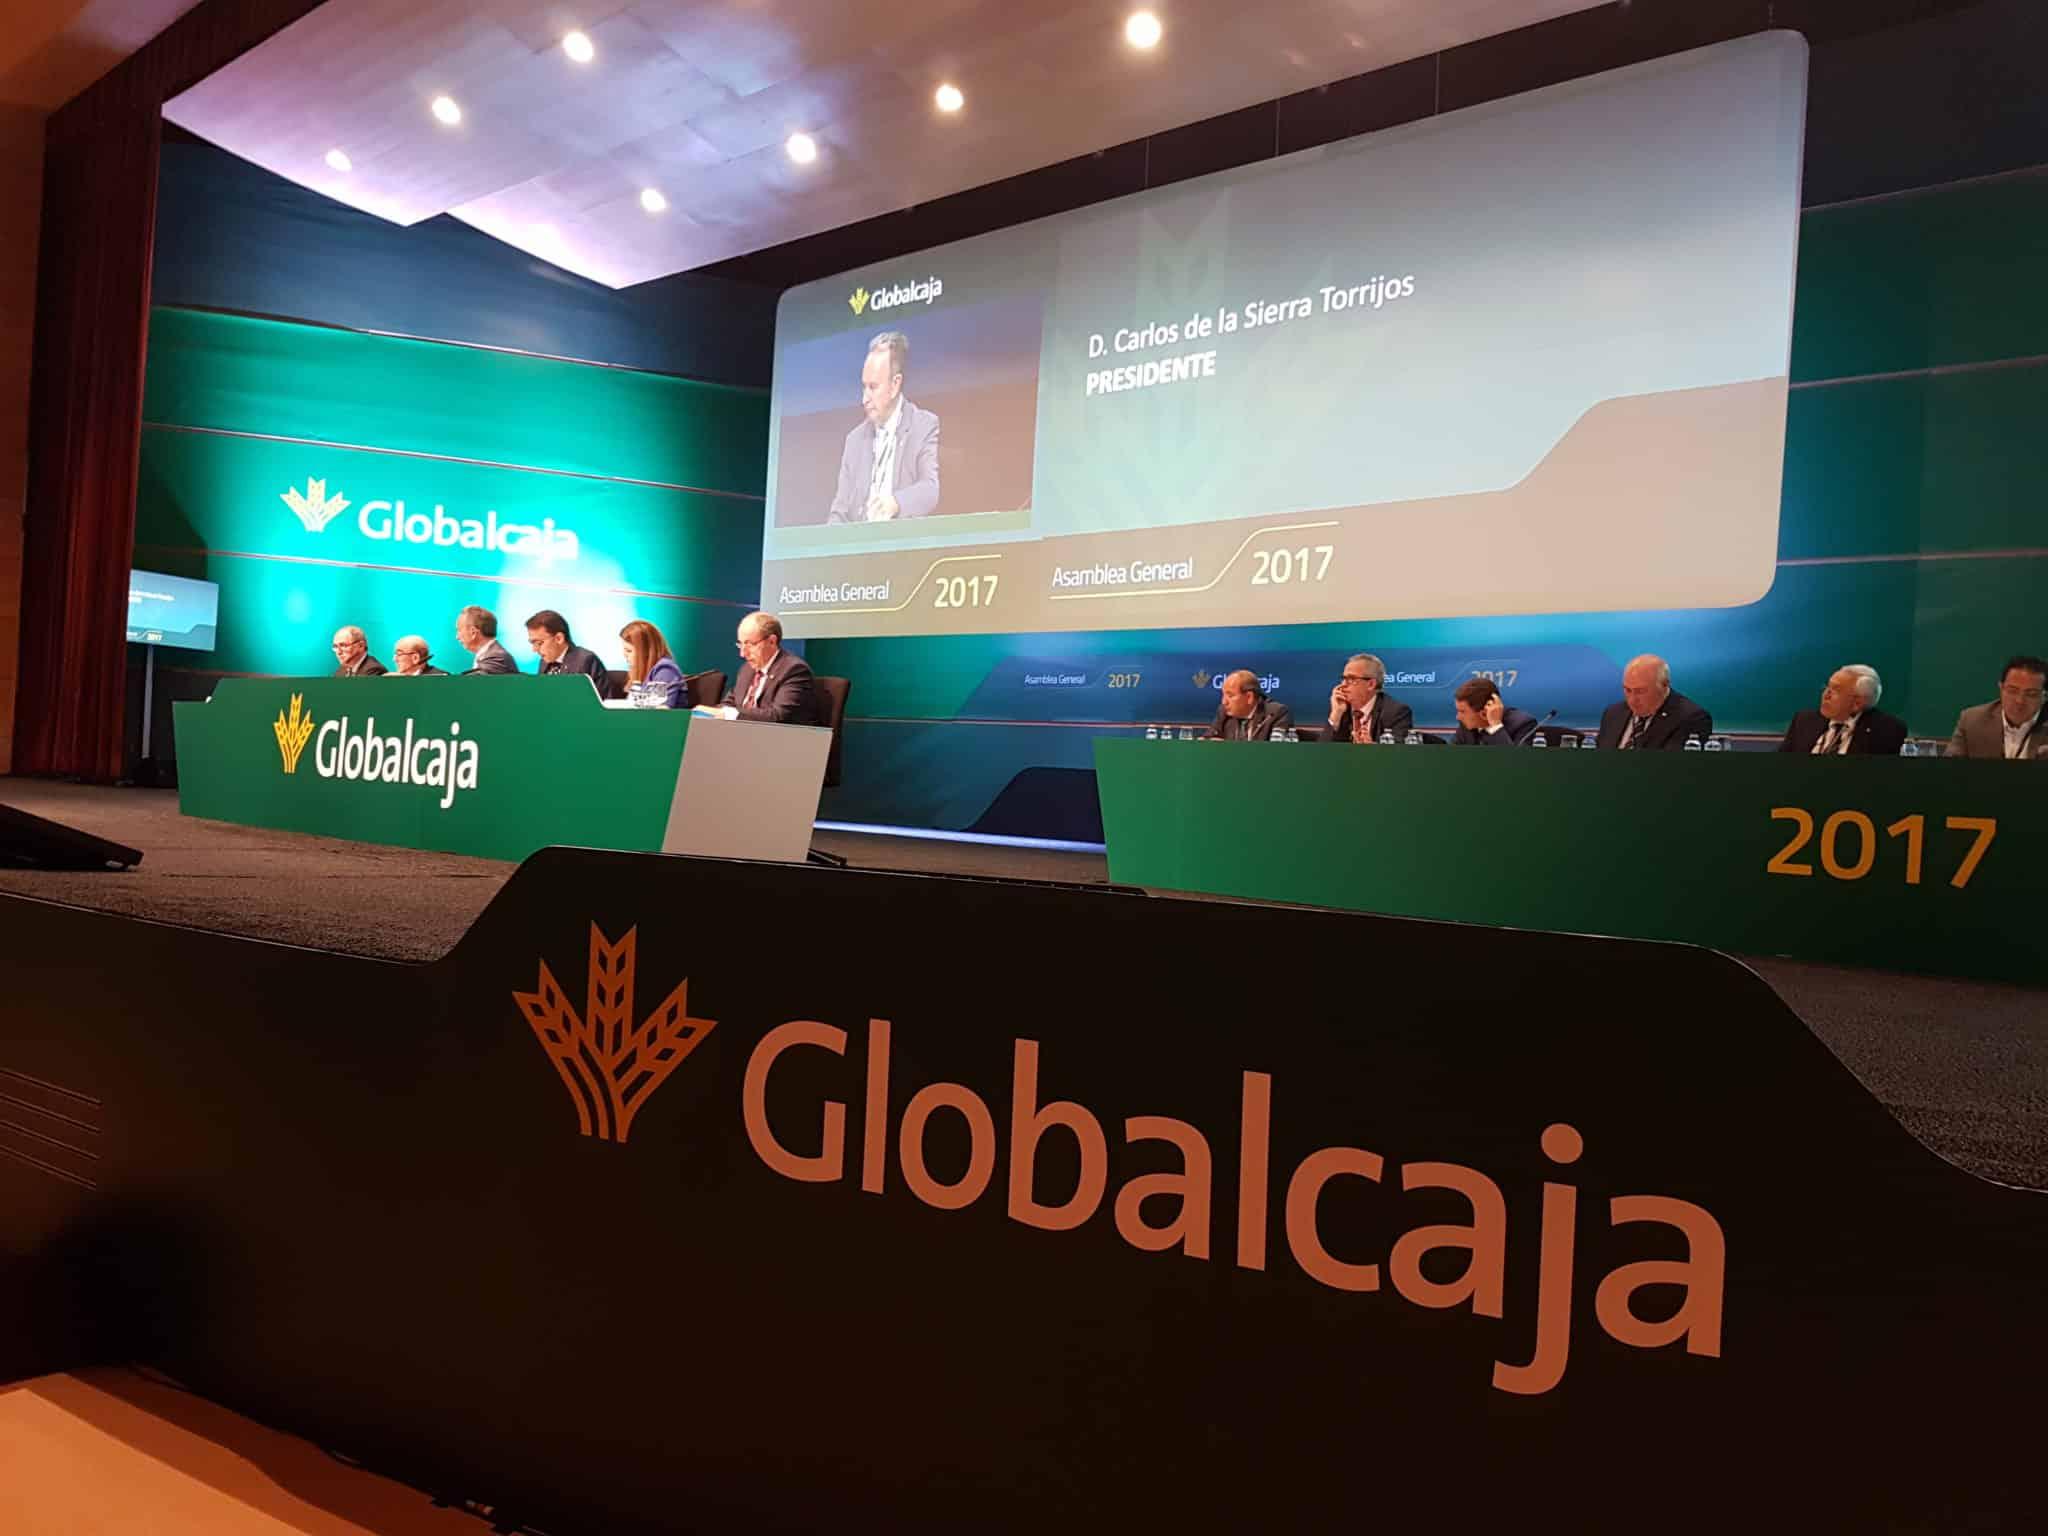 Presidente de Globalcaja en Asamblea General